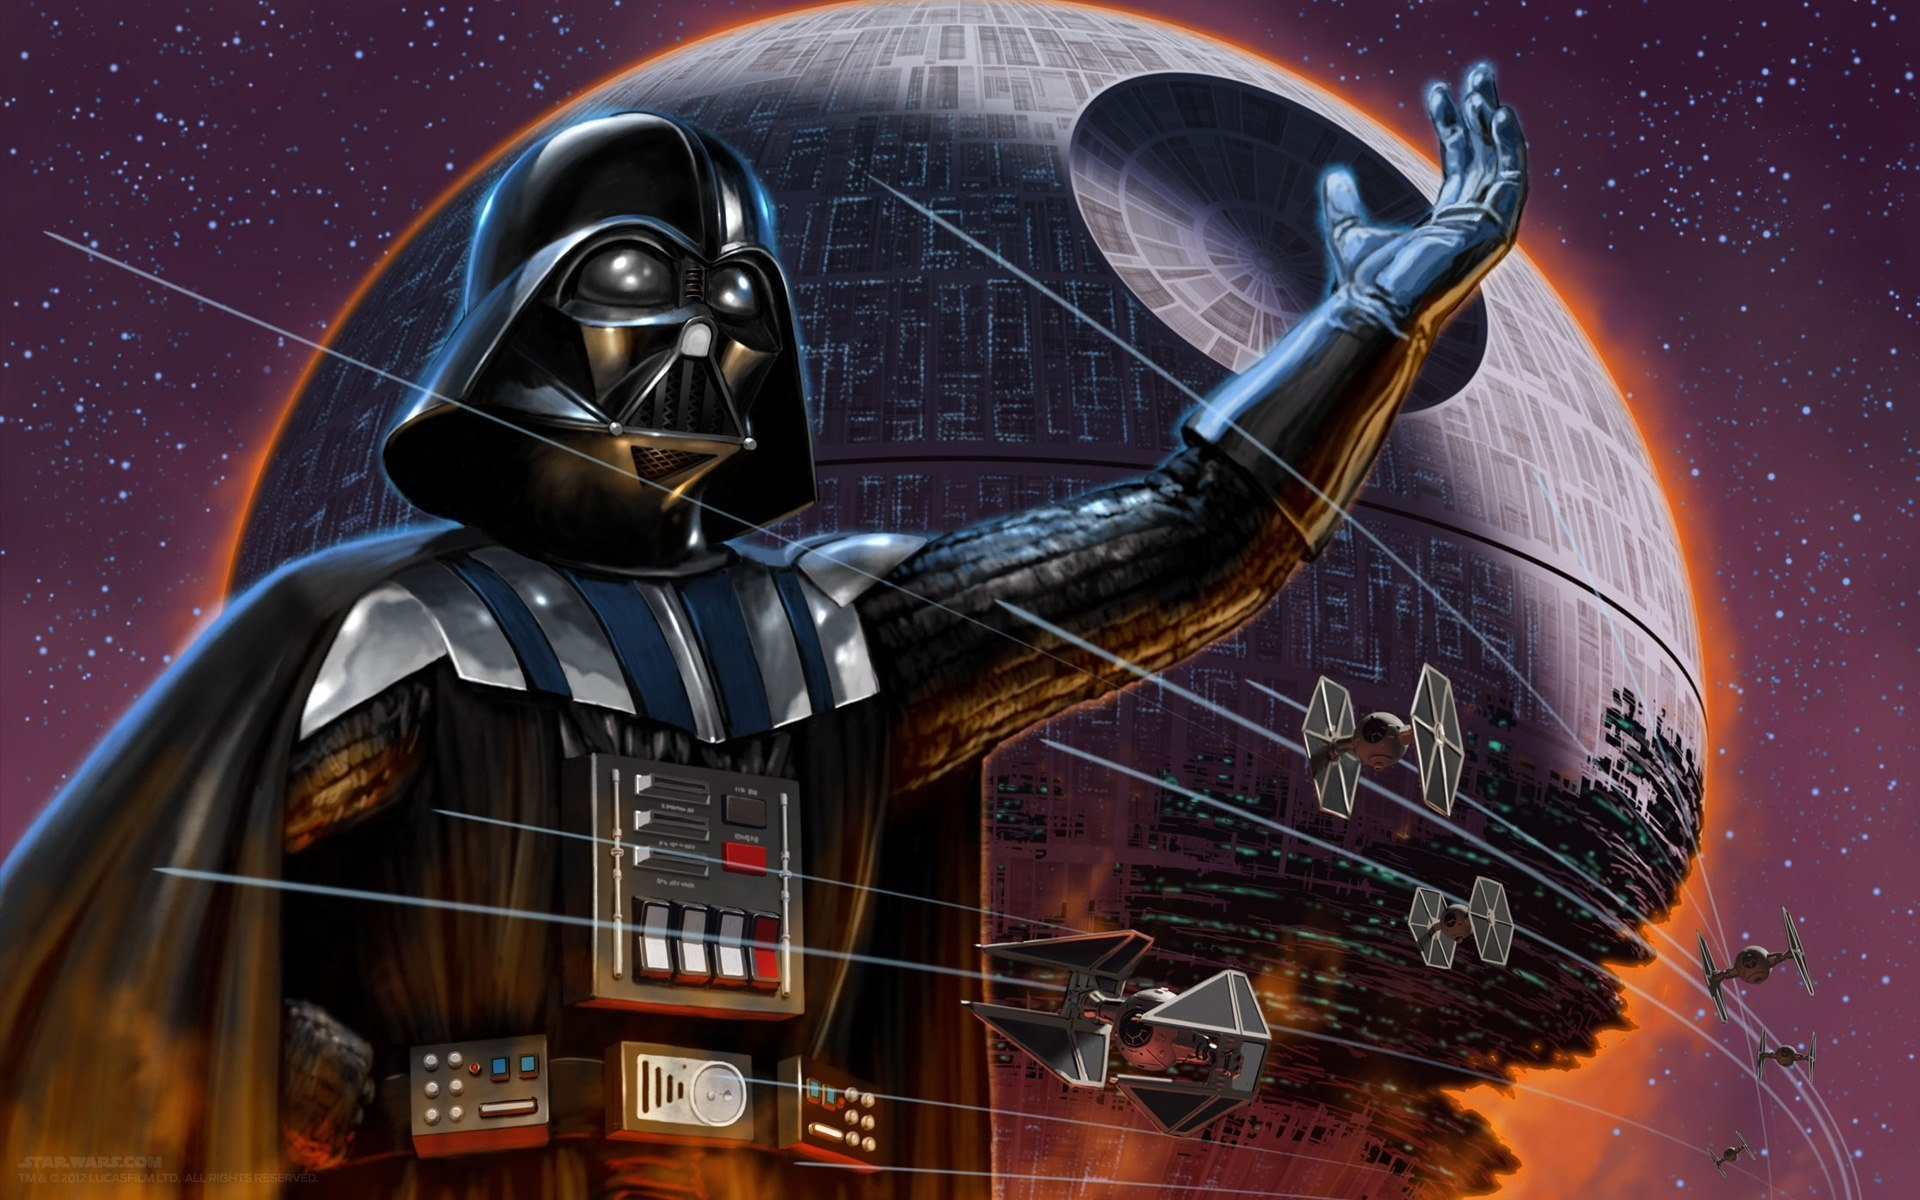 Free Download Wallpaper Hd Darth Vader Star Wars Character Hd Wallpaper Expert 1920x1200 For Your Desktop Mobile Tablet Explore 47 Star Wars 4k Wallpaper Star Wars Desktop Wallpaper Star